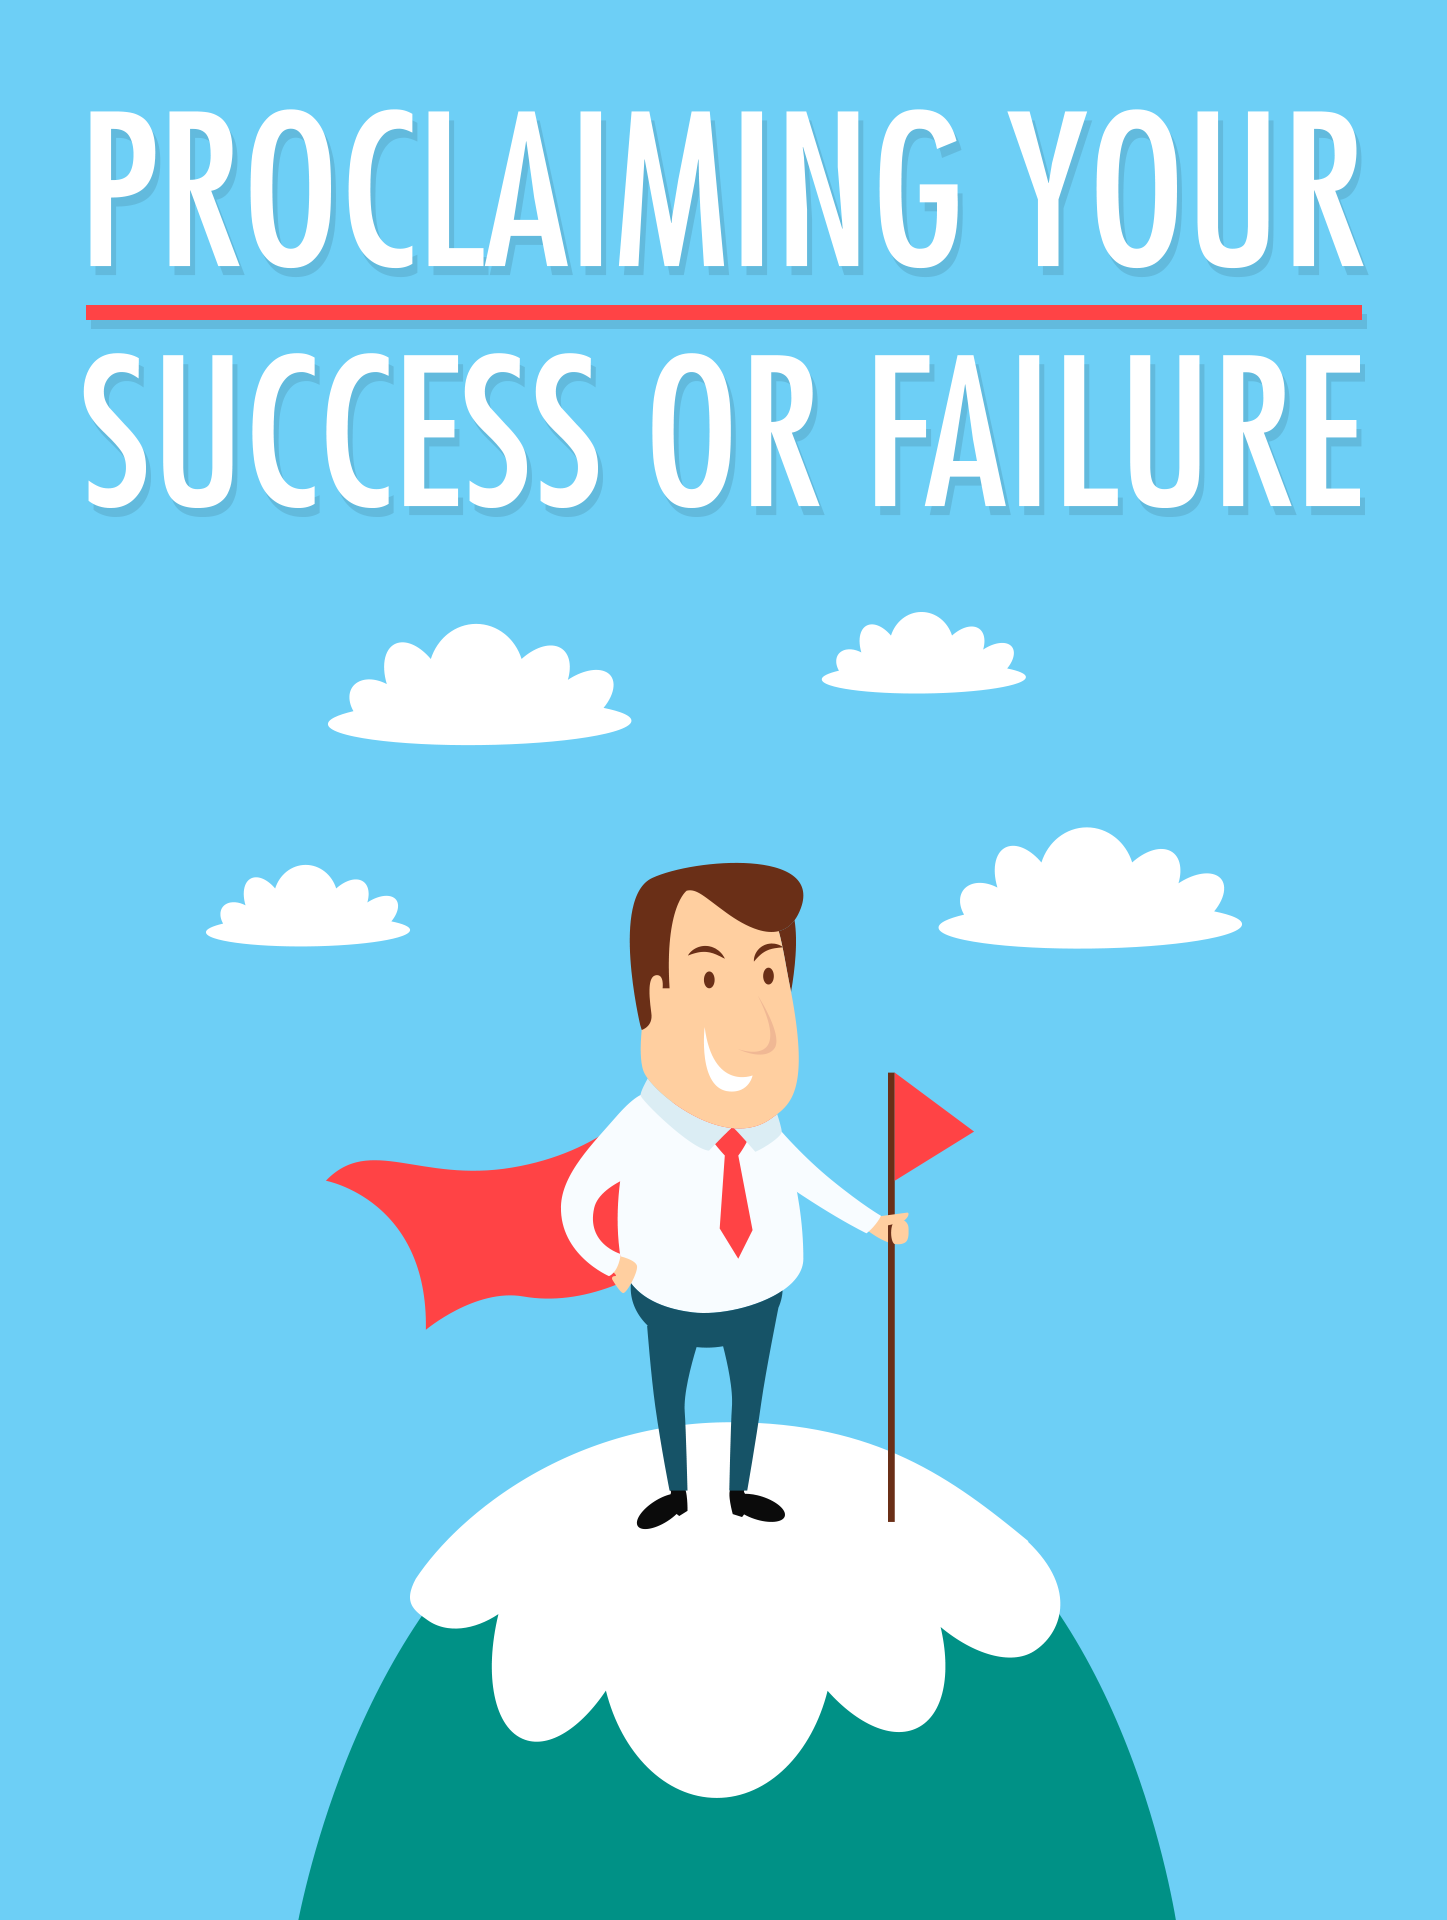 Proclaiming Your Success Or Failure Ebook's Ebook Image